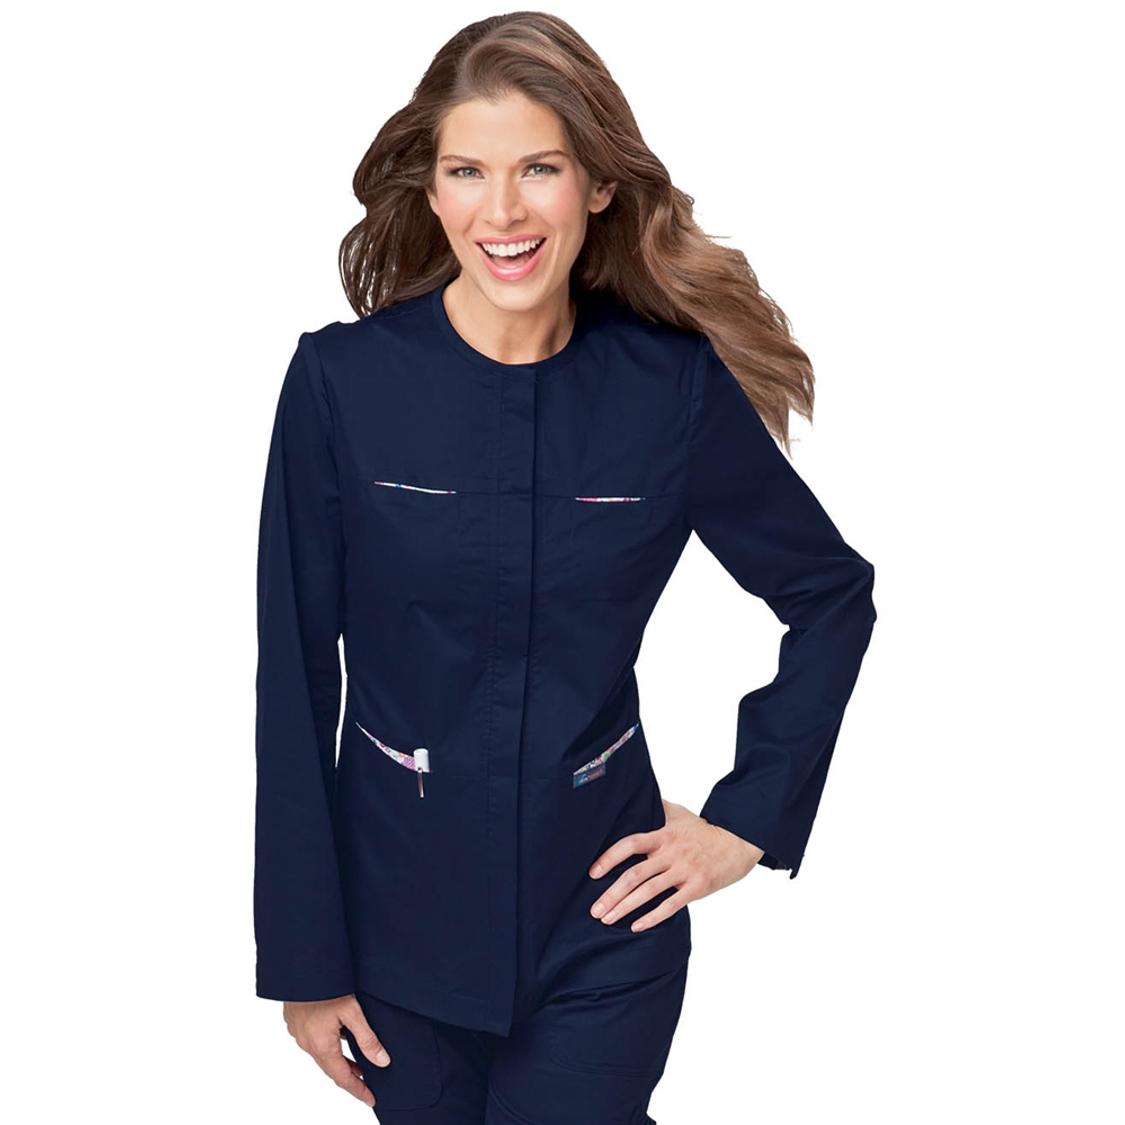 Koi Stretch Mariah Scrub Jacket in Navy at the ...